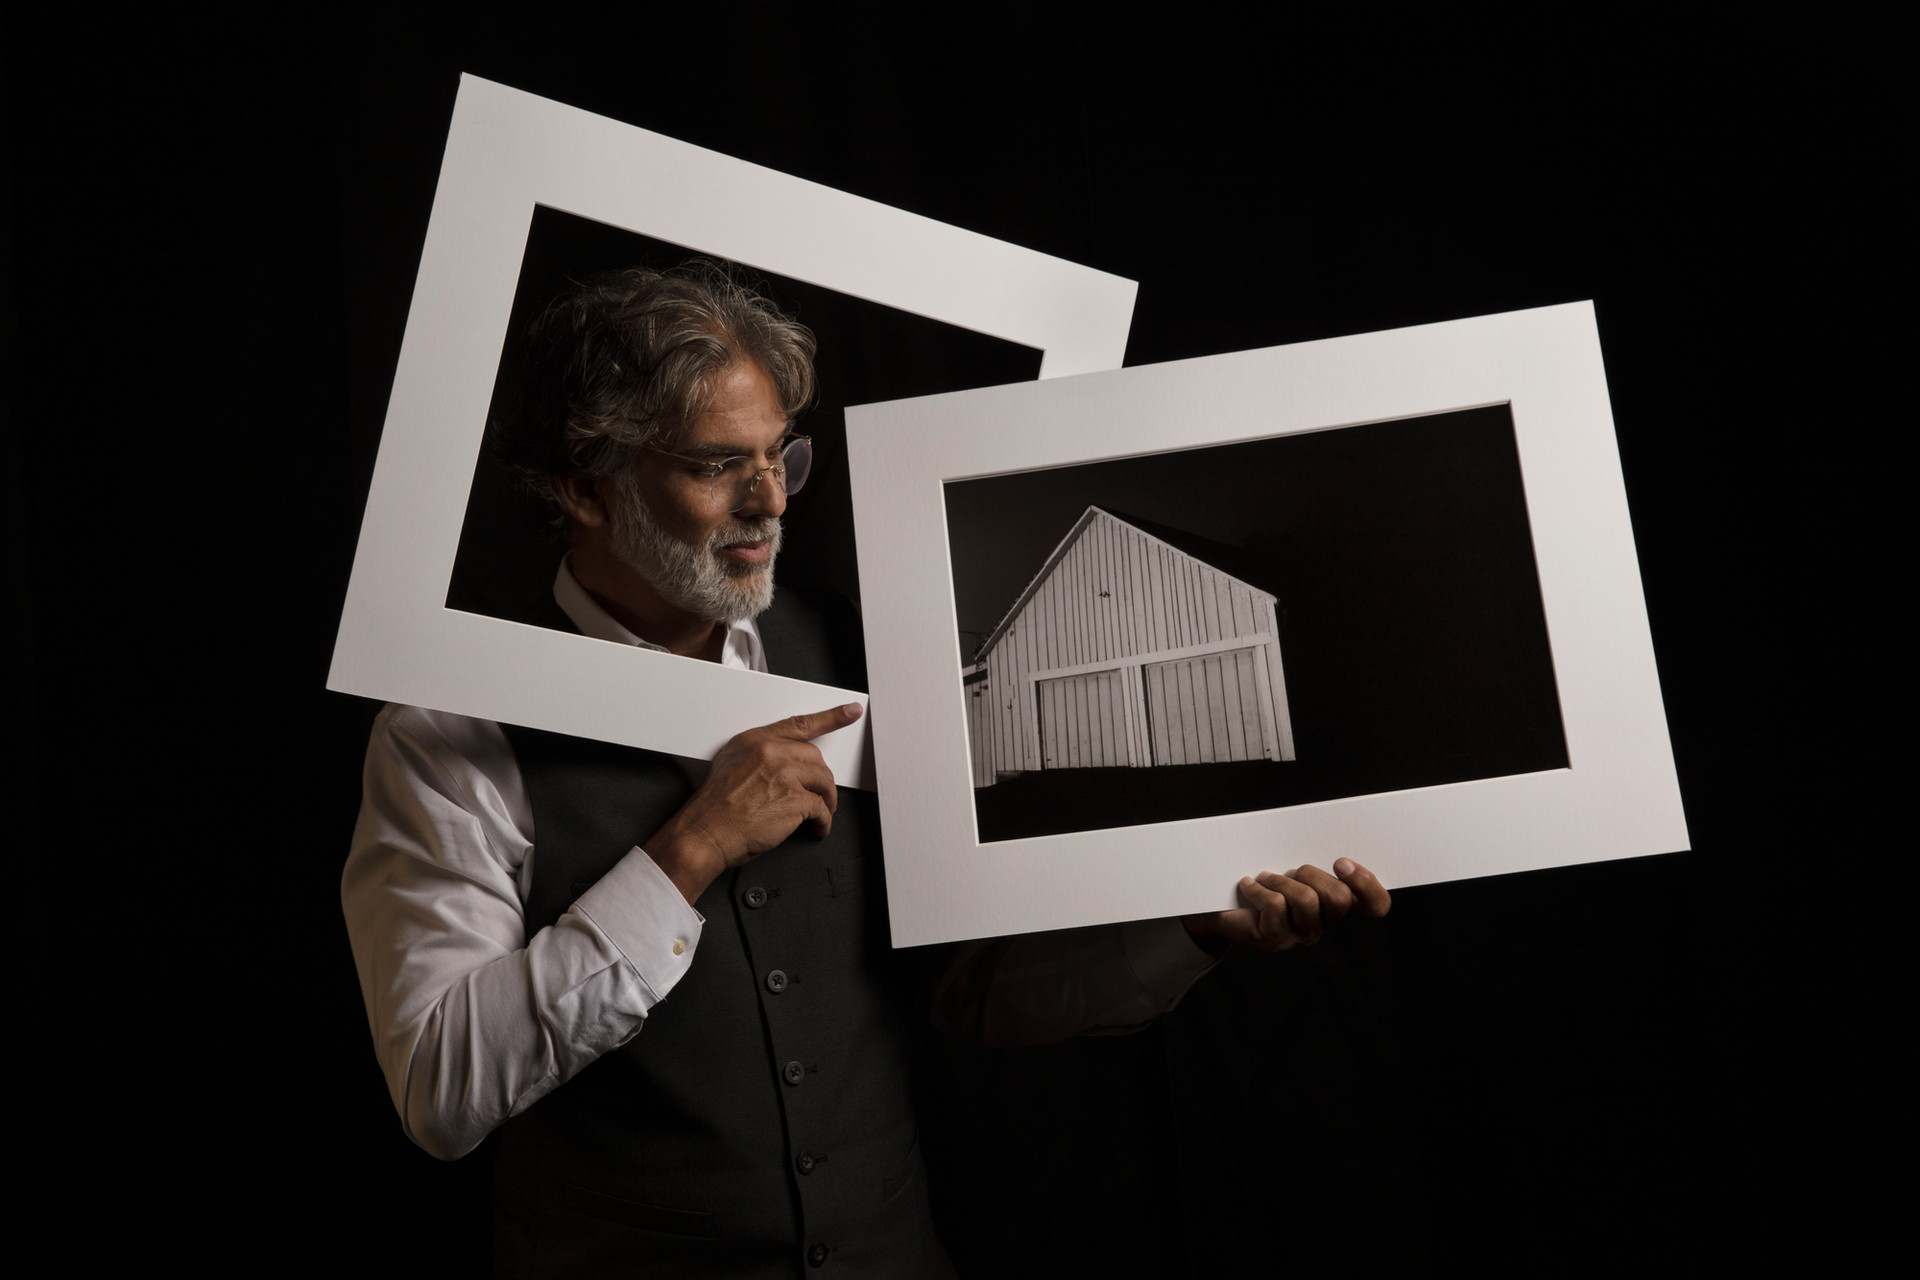 Derek Bacchus/ Photographer